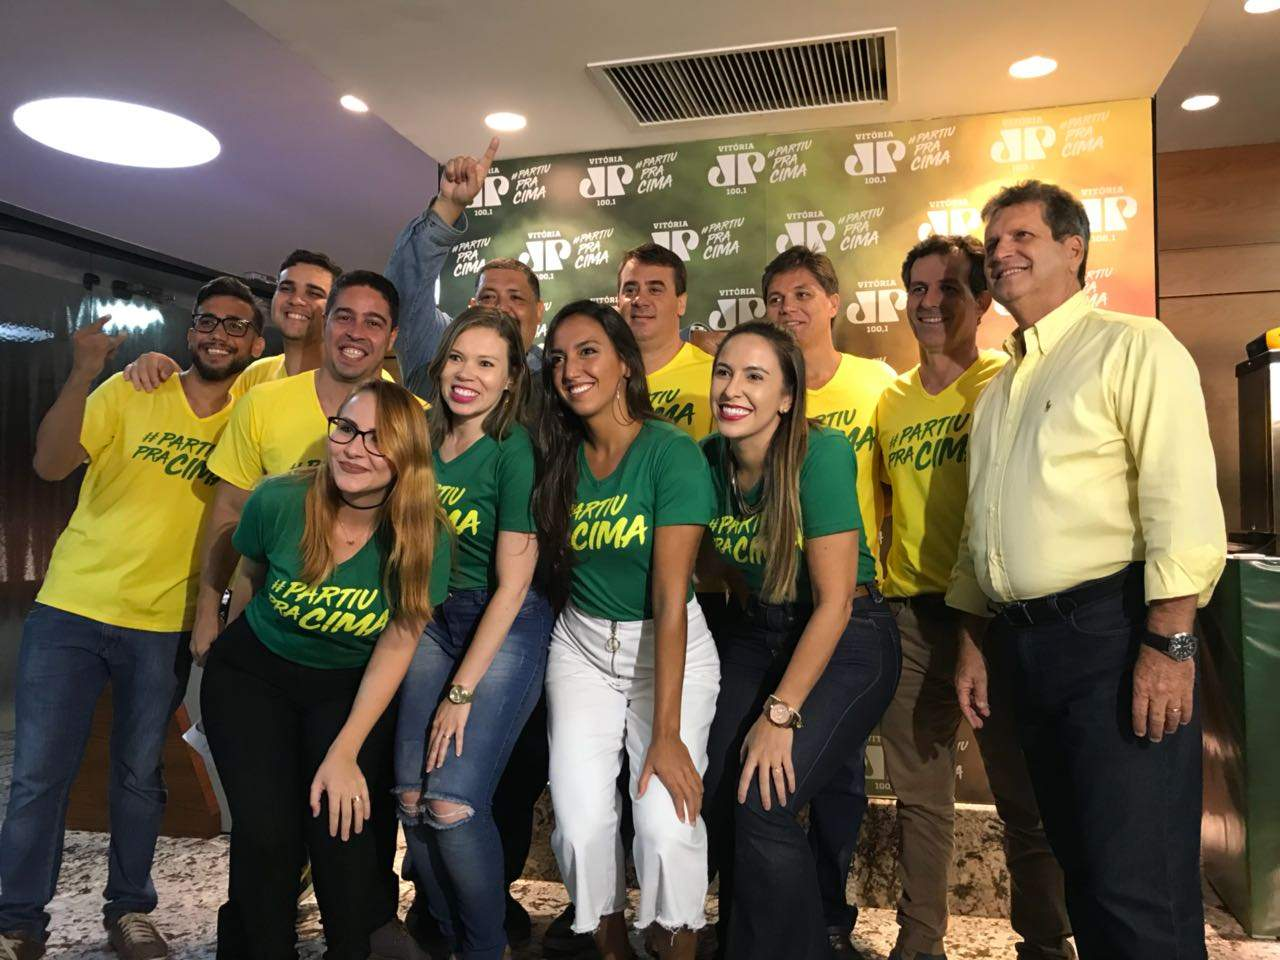 2baf1253a6 Jovem Pan Vitória lança campanha  PartiuPraCima